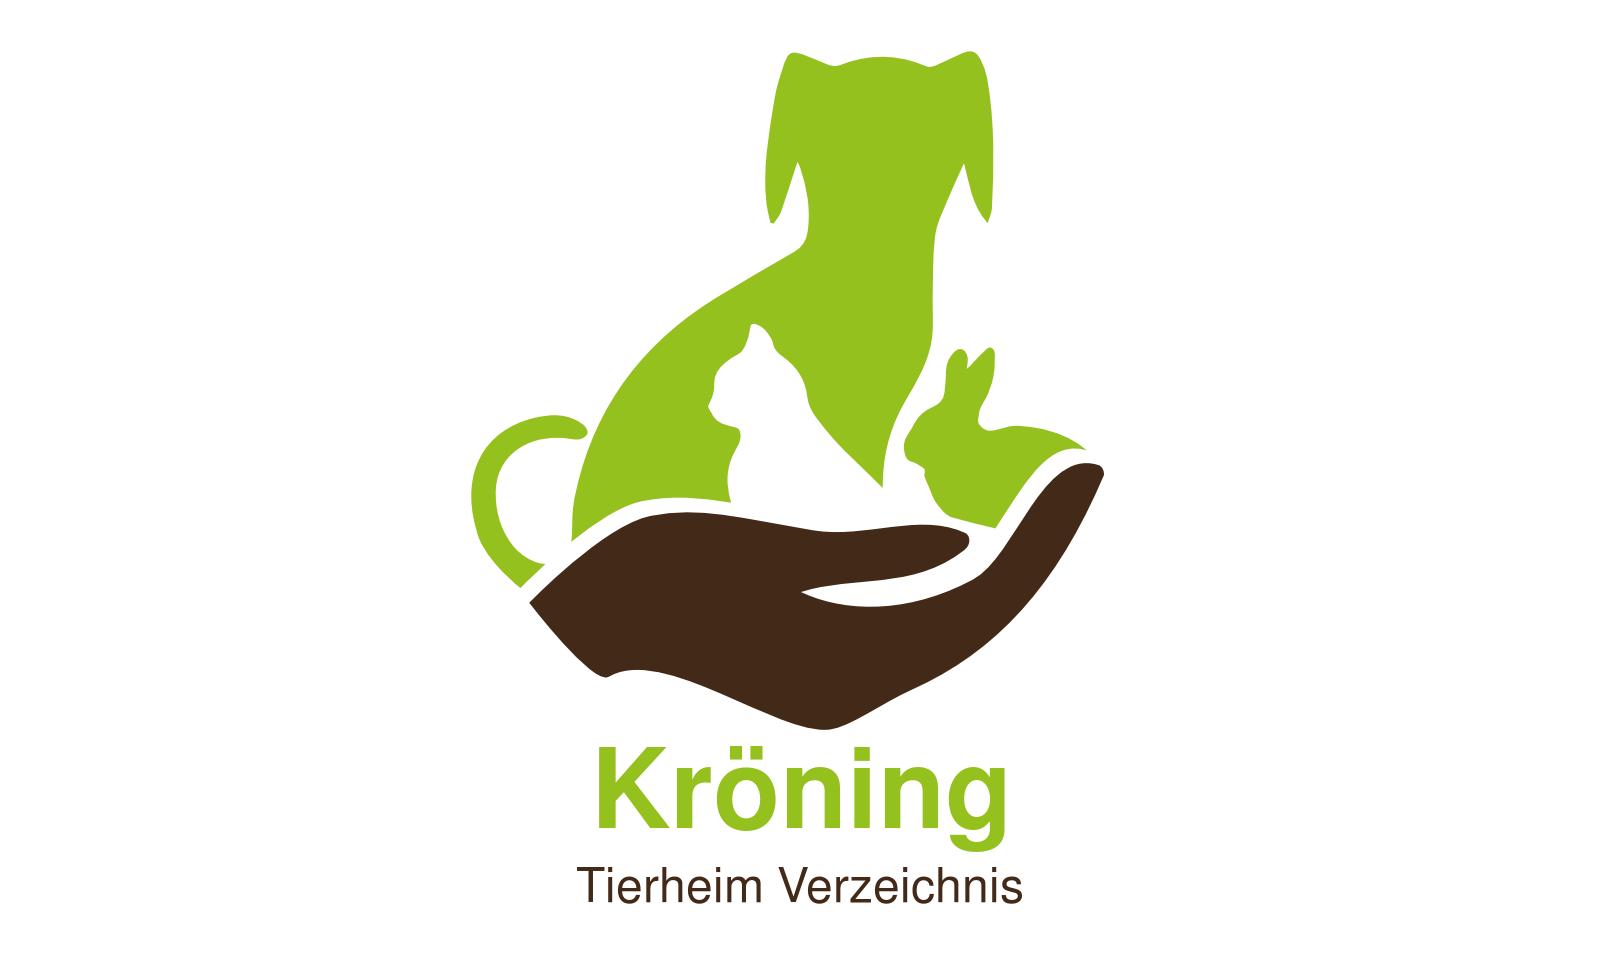 Tierheim Kröning